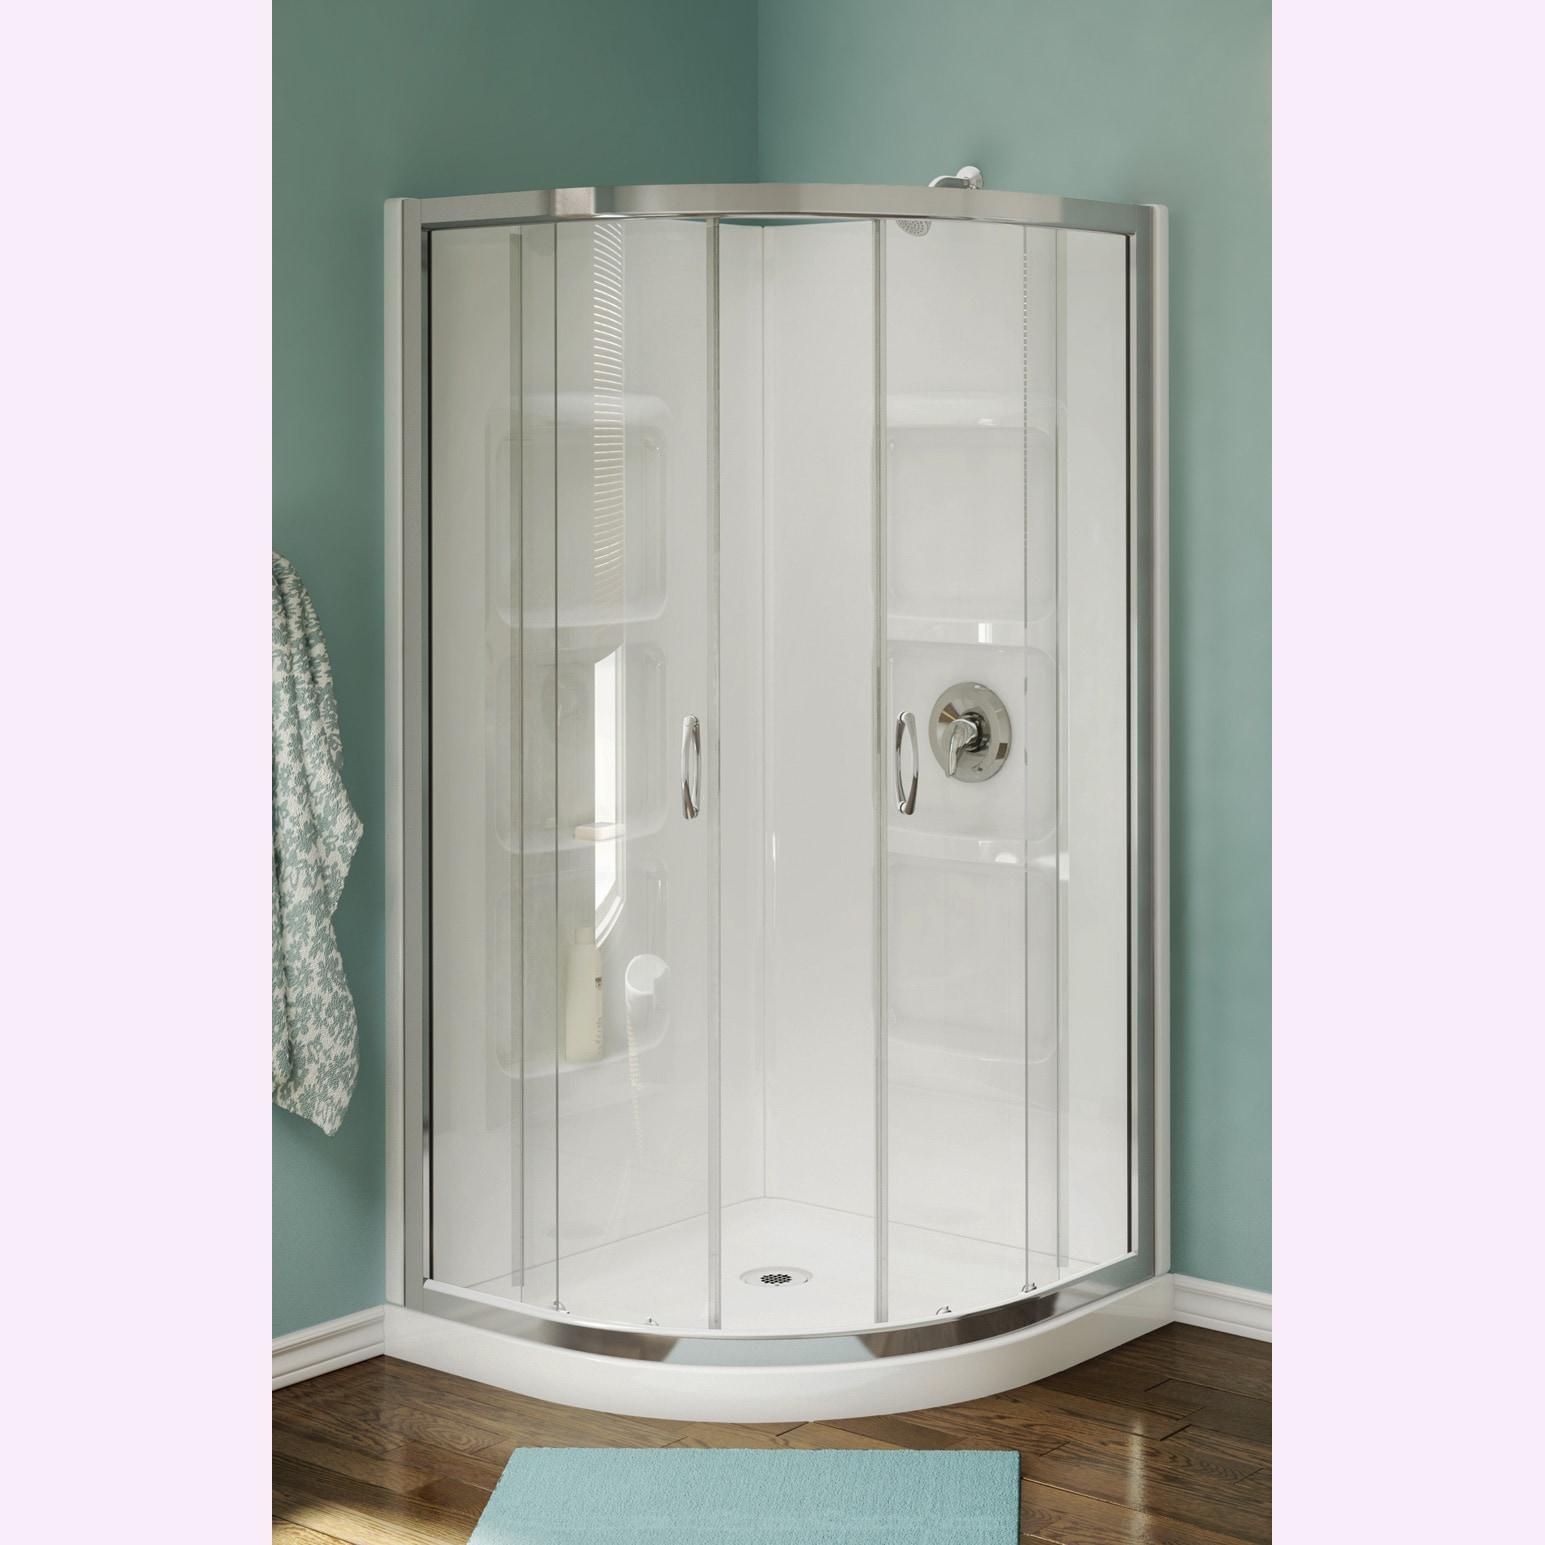 Nevada 38 Inch Pure Acrylic Neo Round Corner Shower Stall Overstock Shoppin